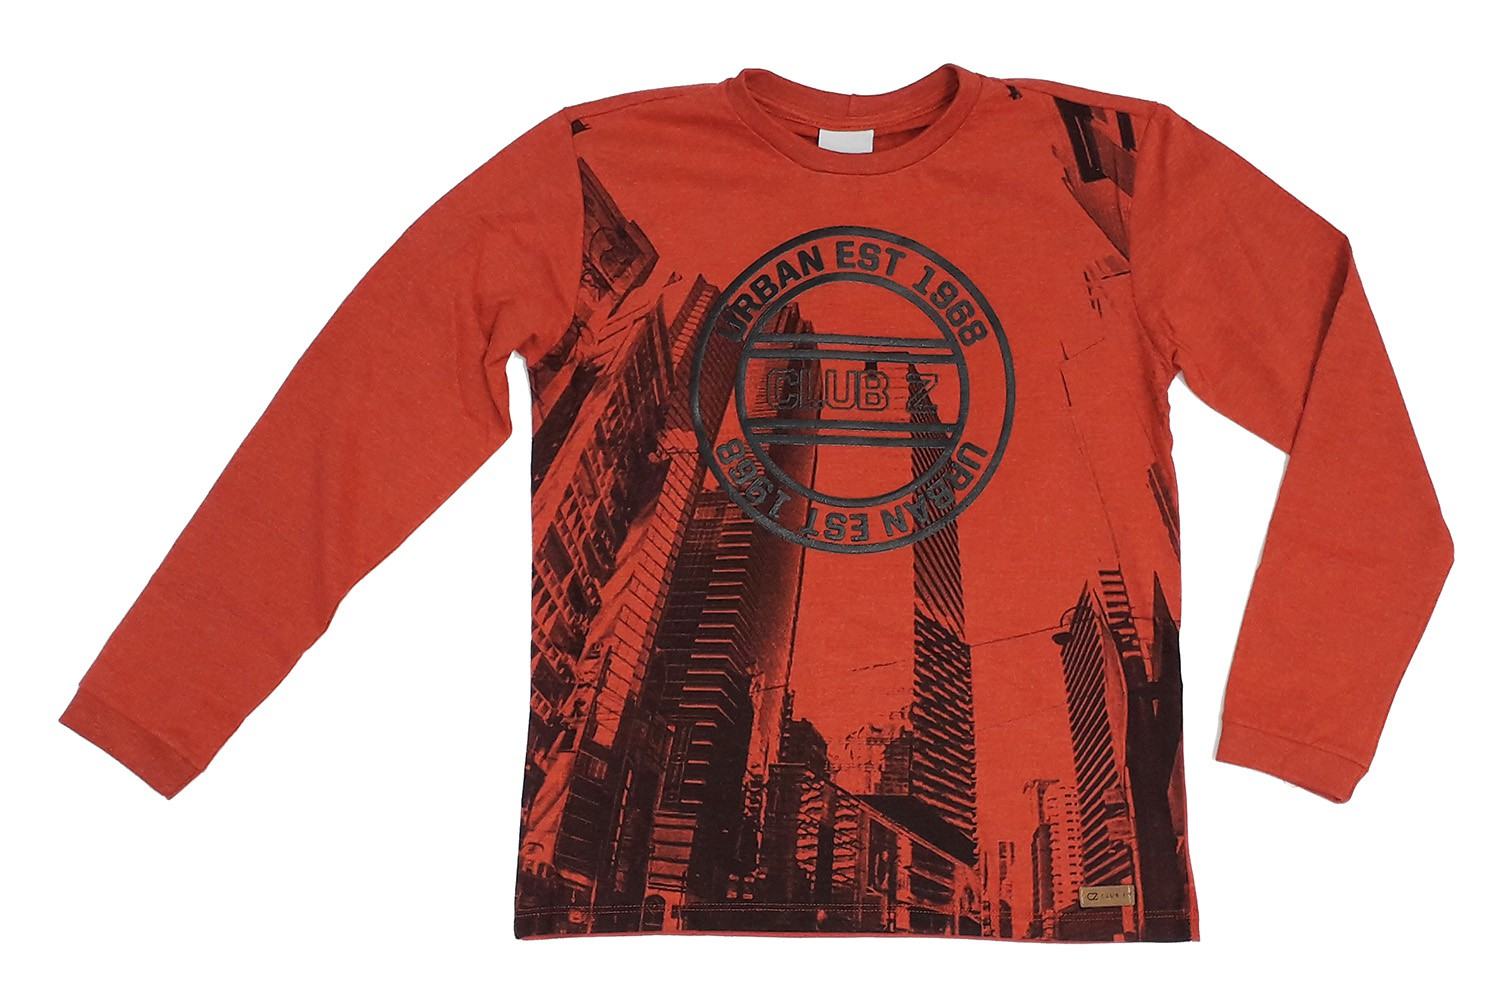 Roupa Infantil Masculina Camiseta Vermelha Estampada Club Z